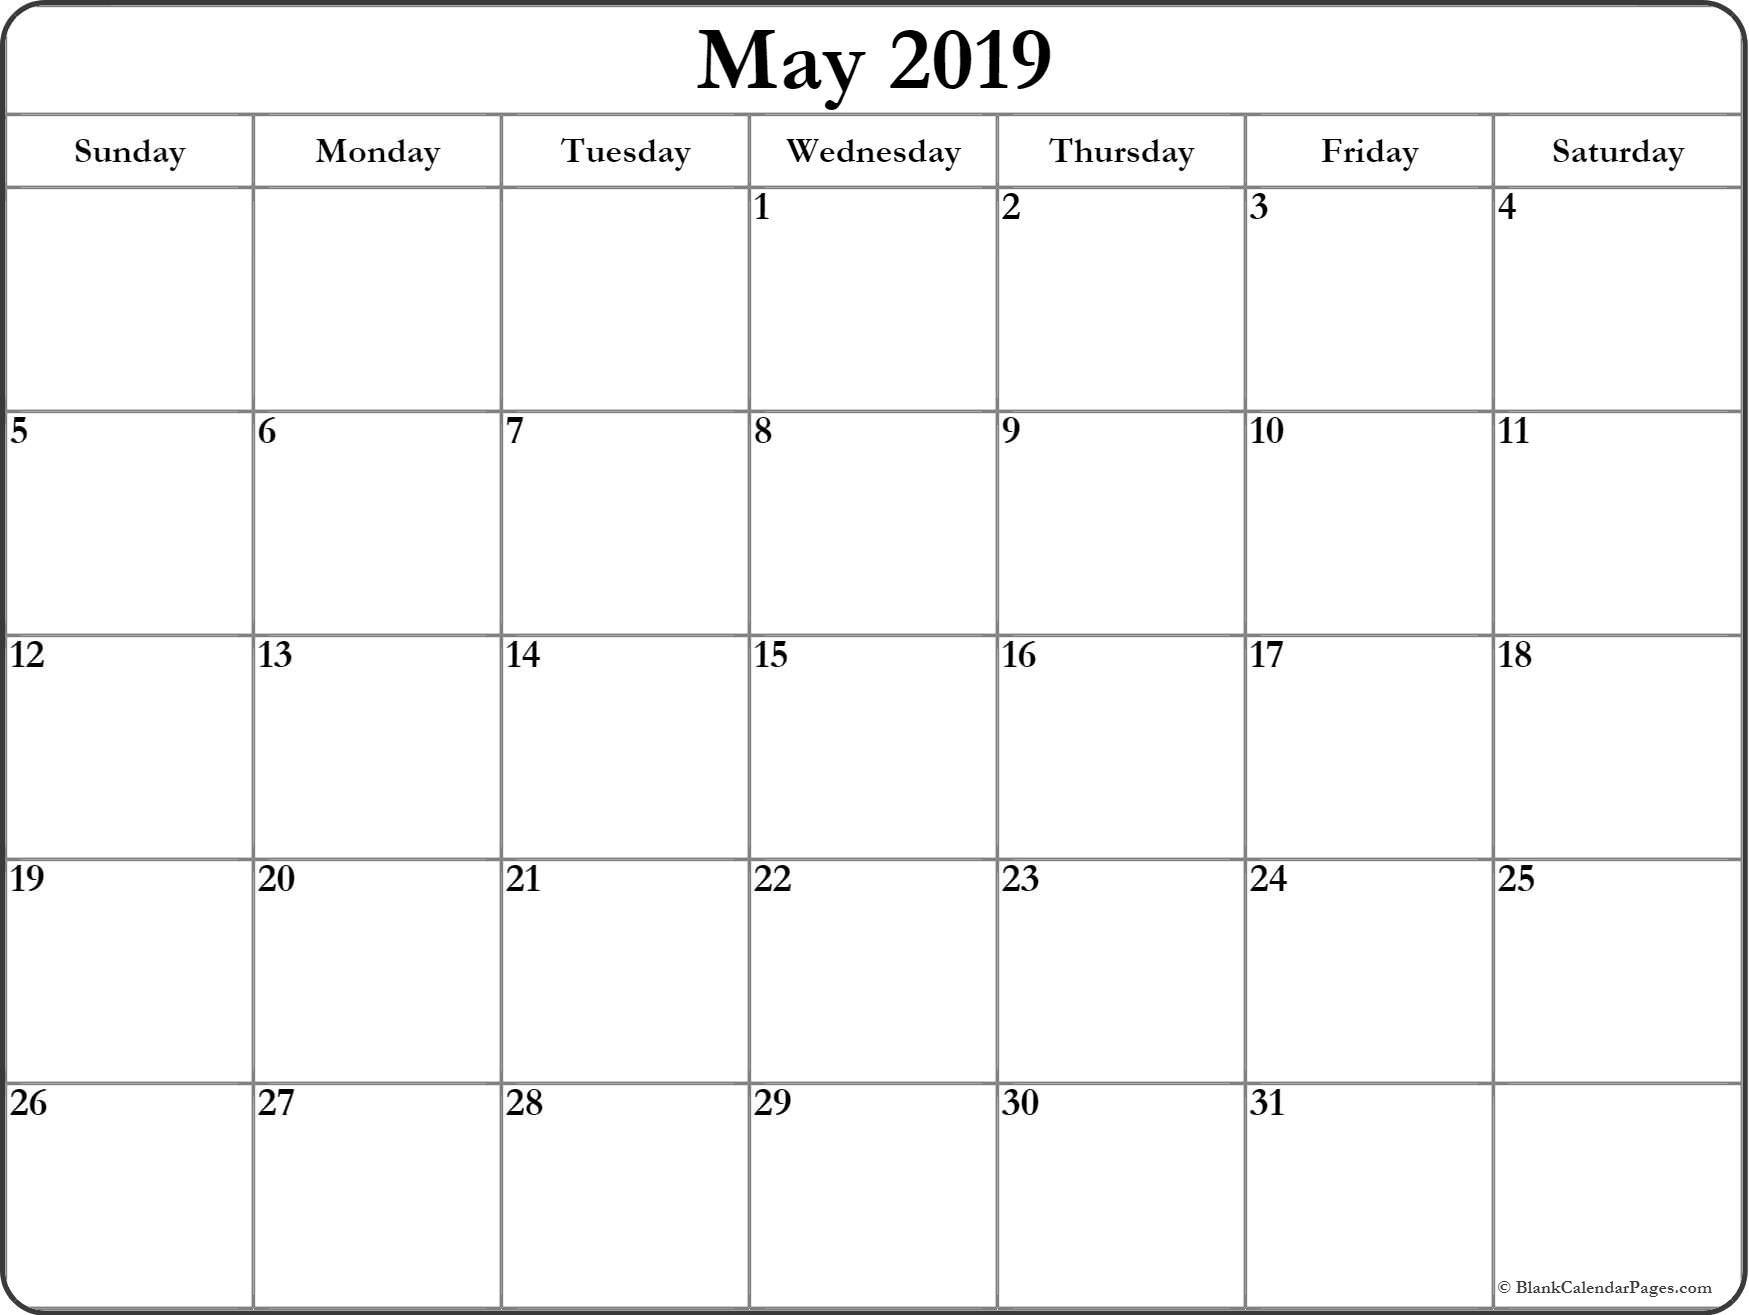 Printable Calendar May 2019 | 200+ May 2019 Calendar